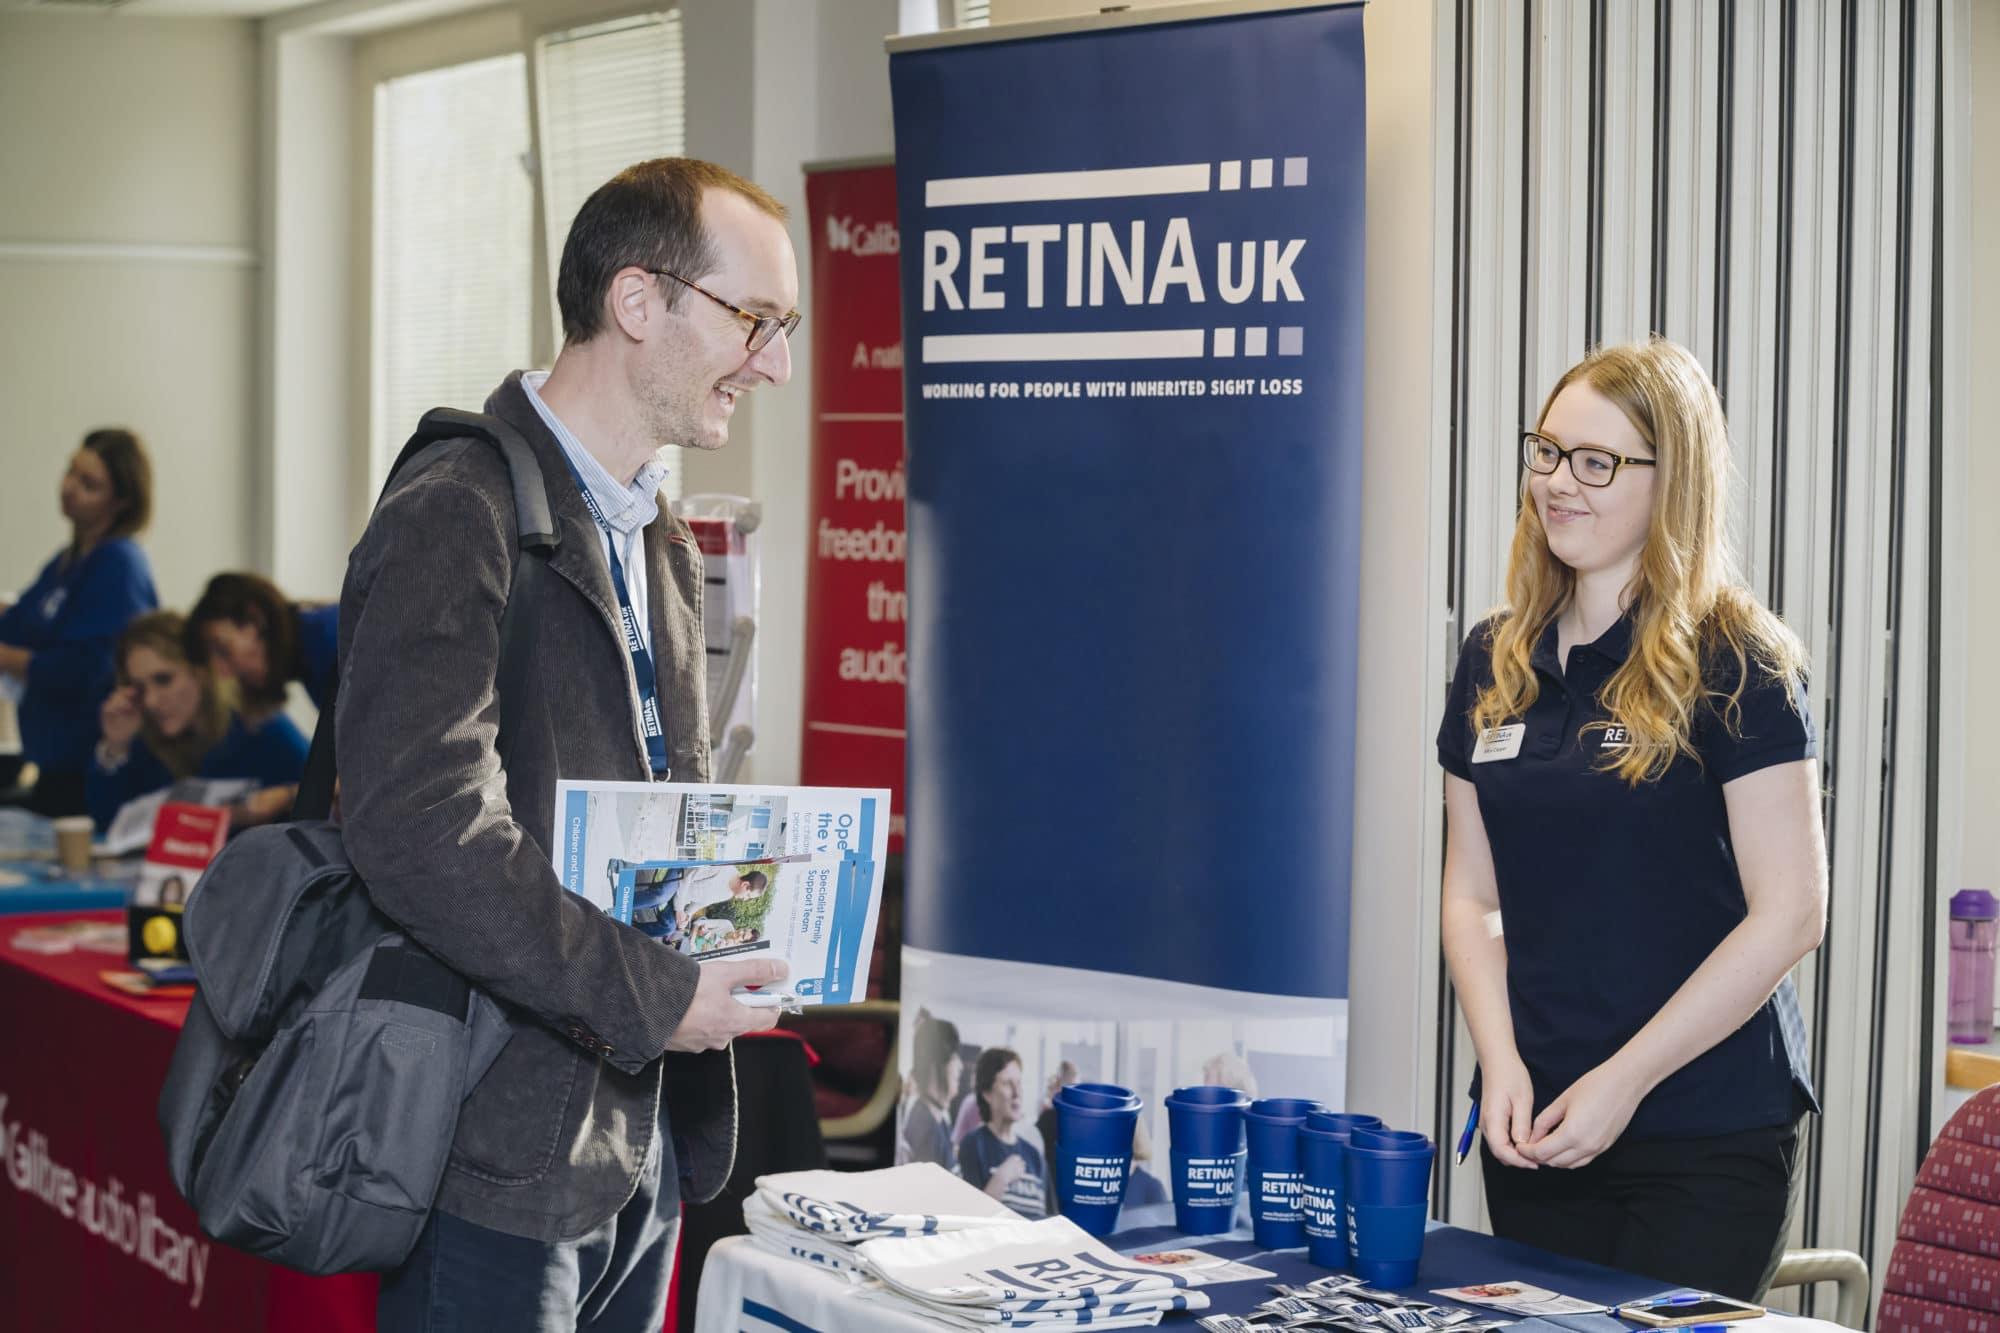 A man speaking to a Retina UK member of staff